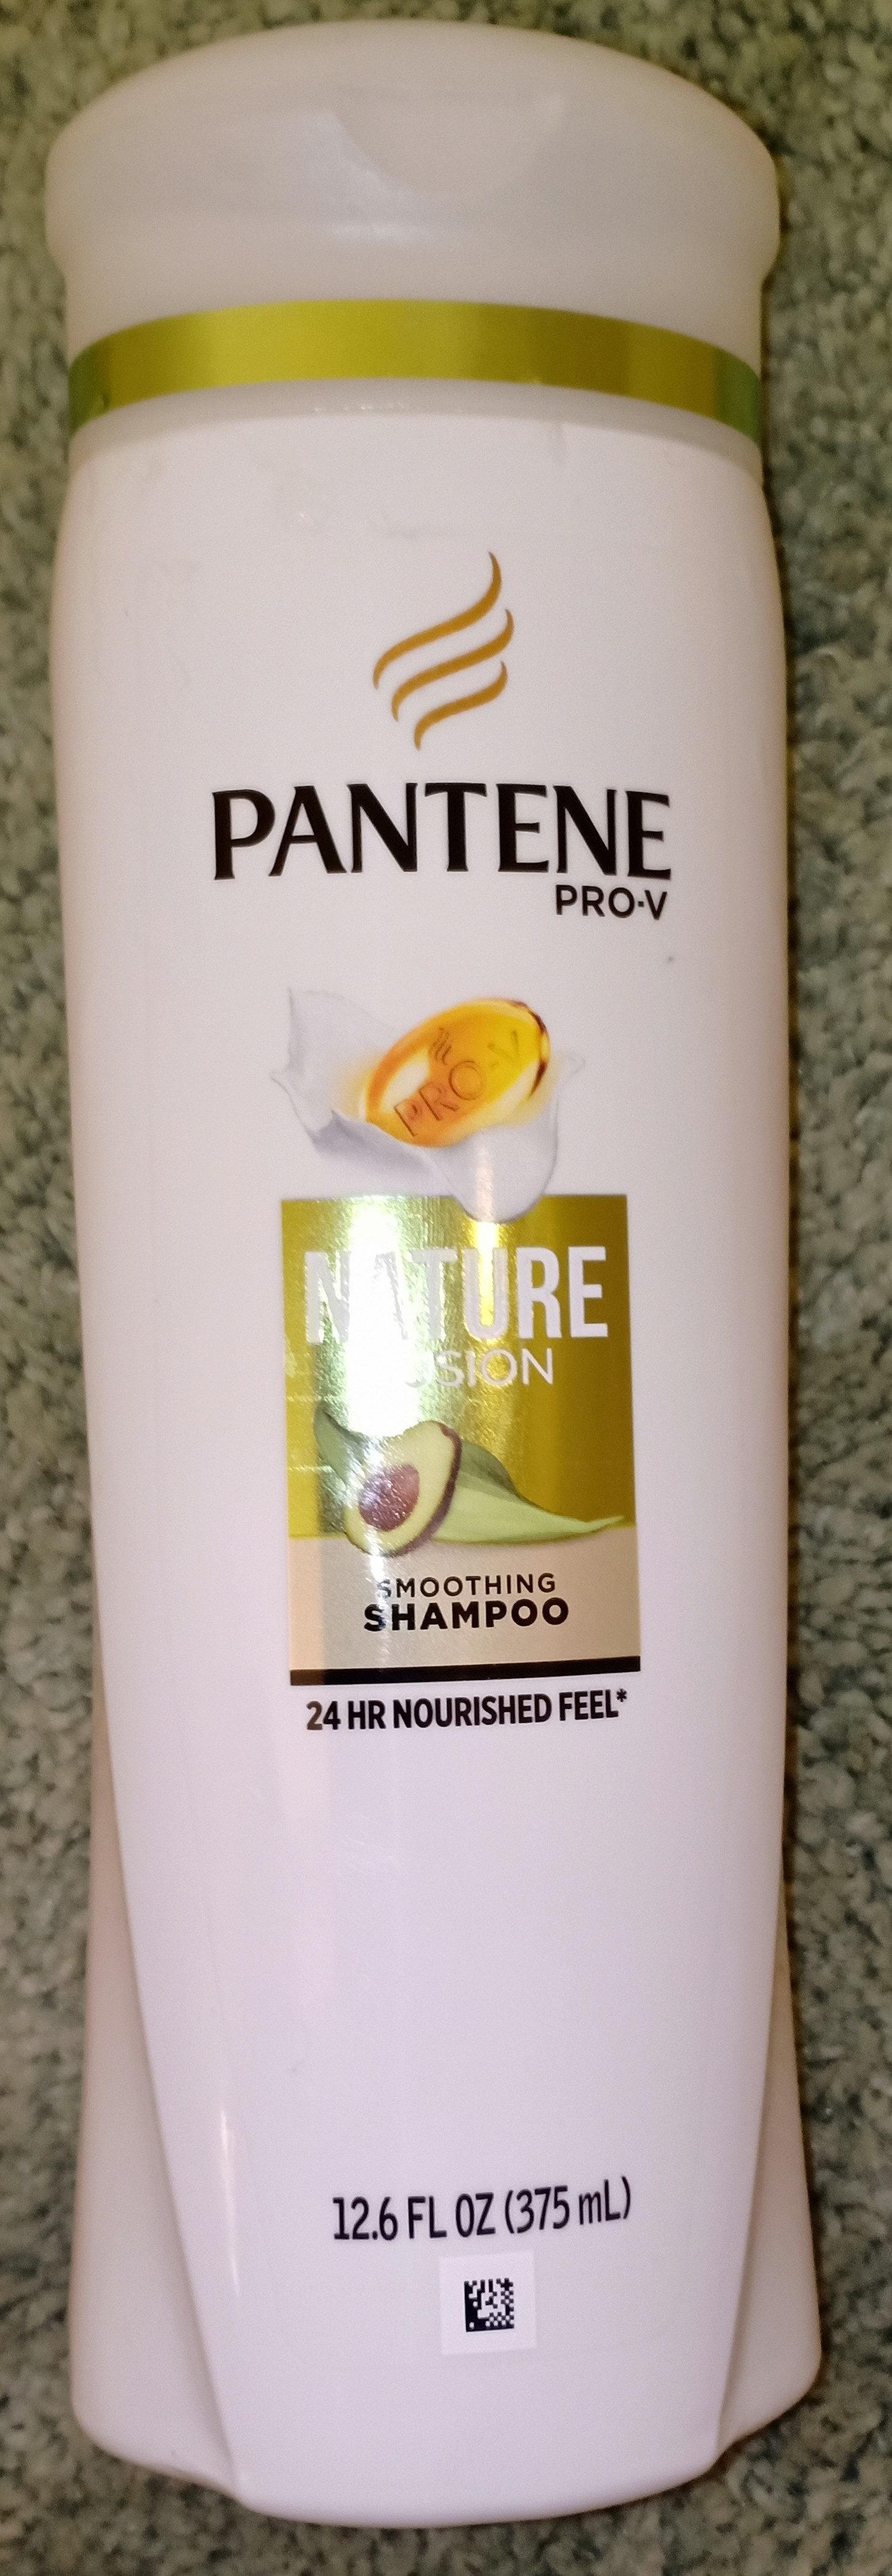 smoothing shampoo - Product - en